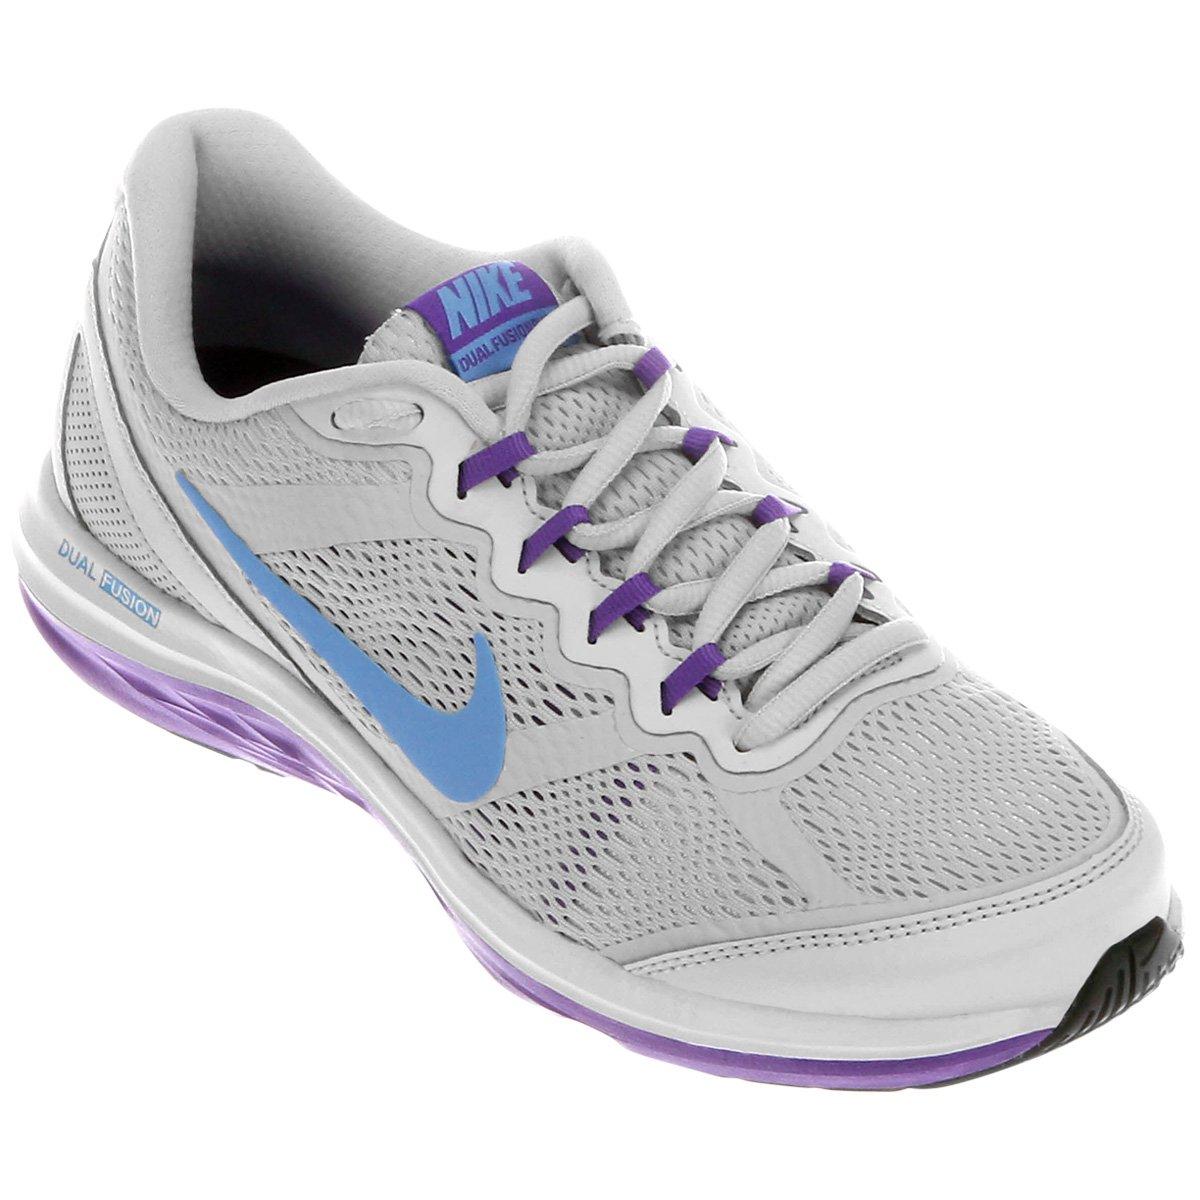 70737160c90 Tênis Nike Dual Fusion Run 3 MSL - Compre Agora